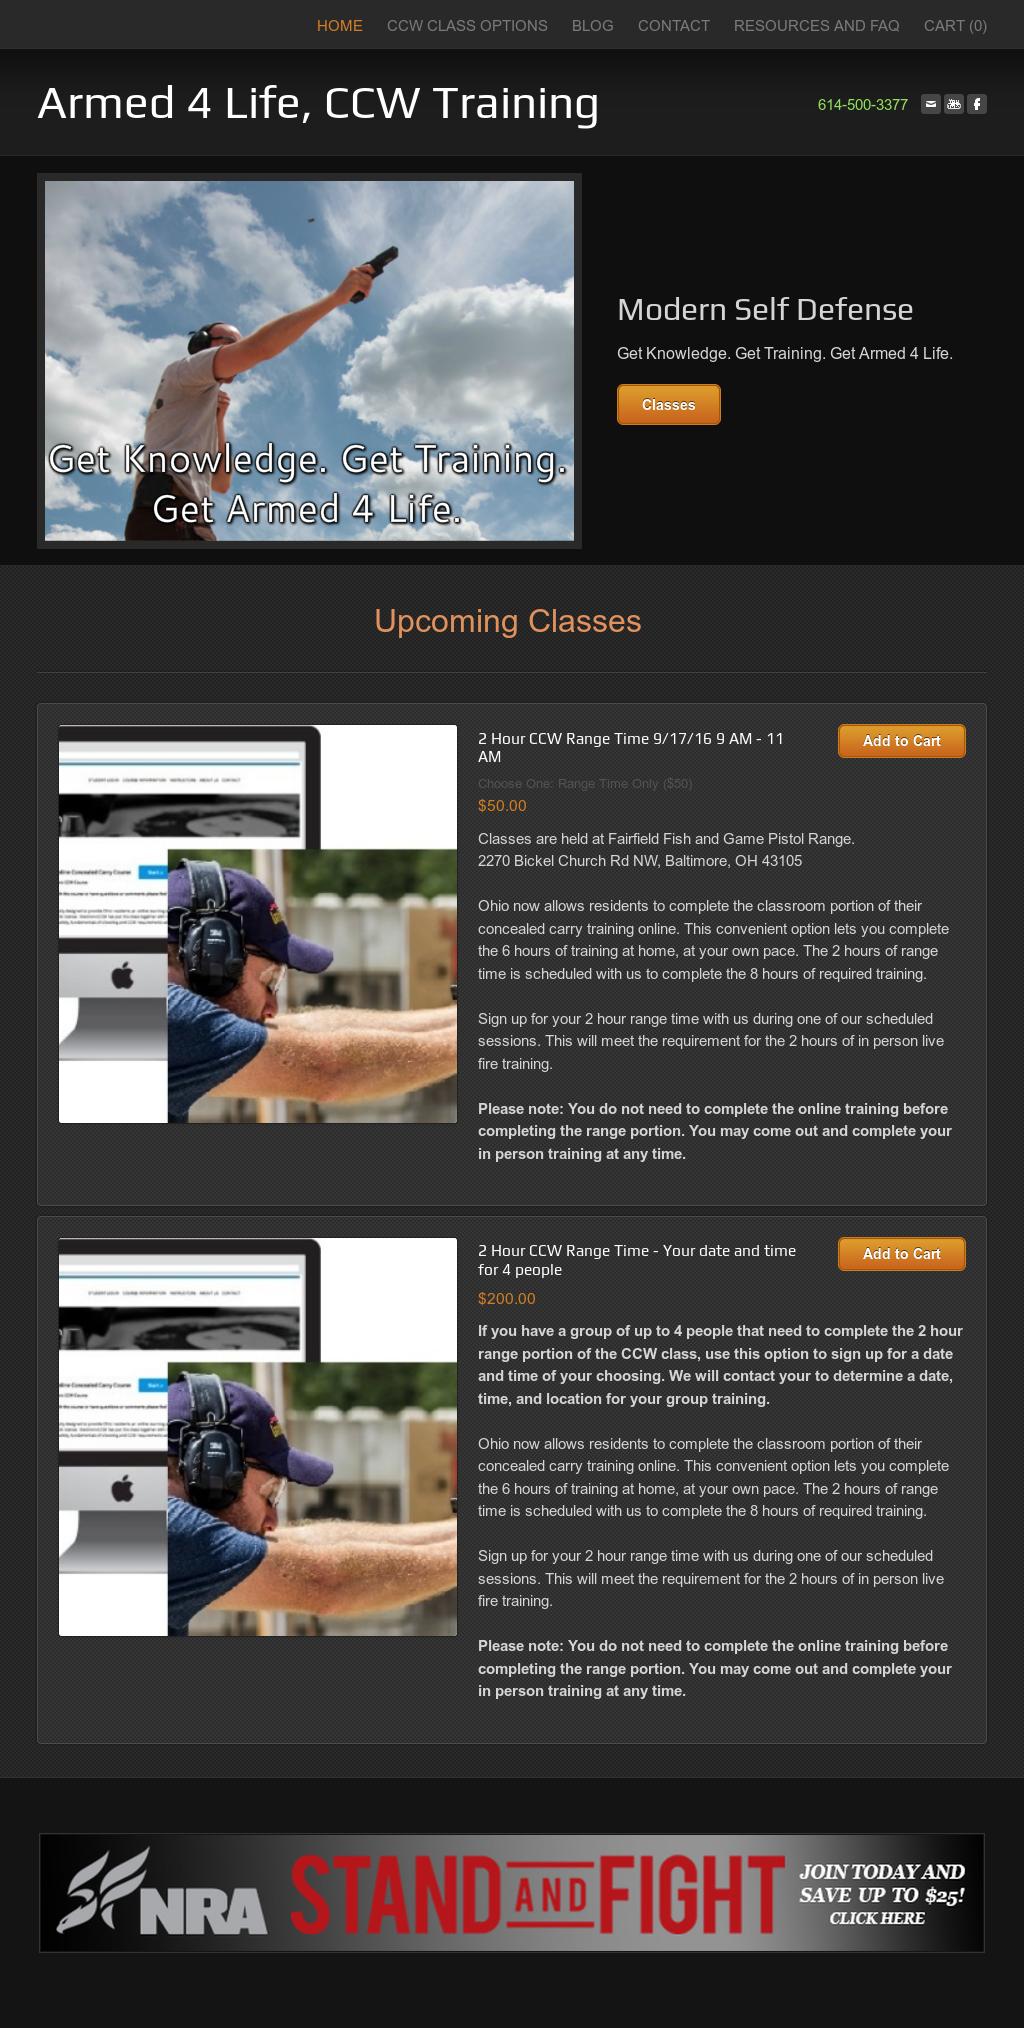 dating web stranice baltimore kuhanje za spajanje